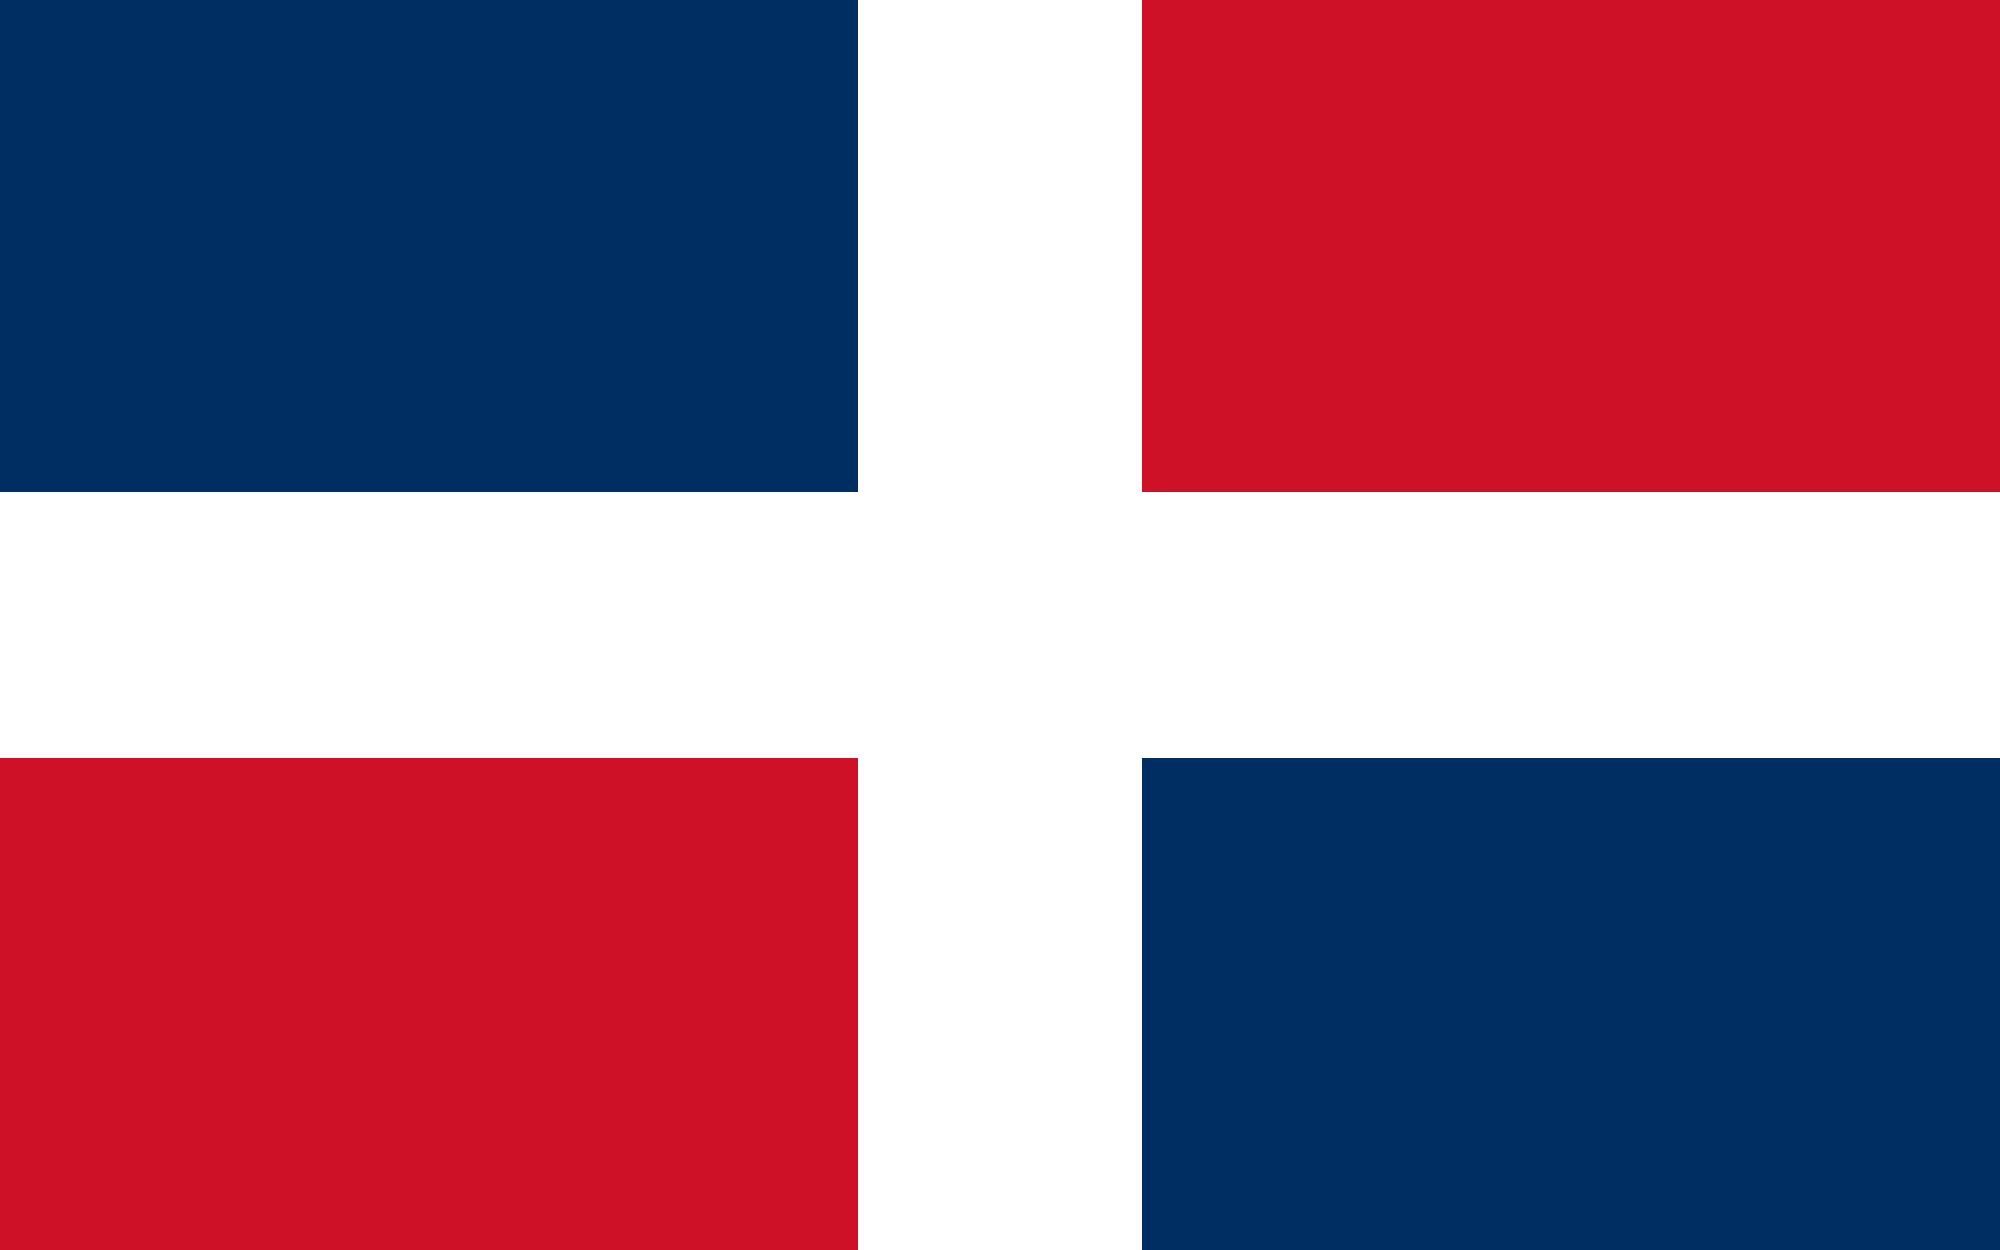 Dominican Republic (Civil ensign)